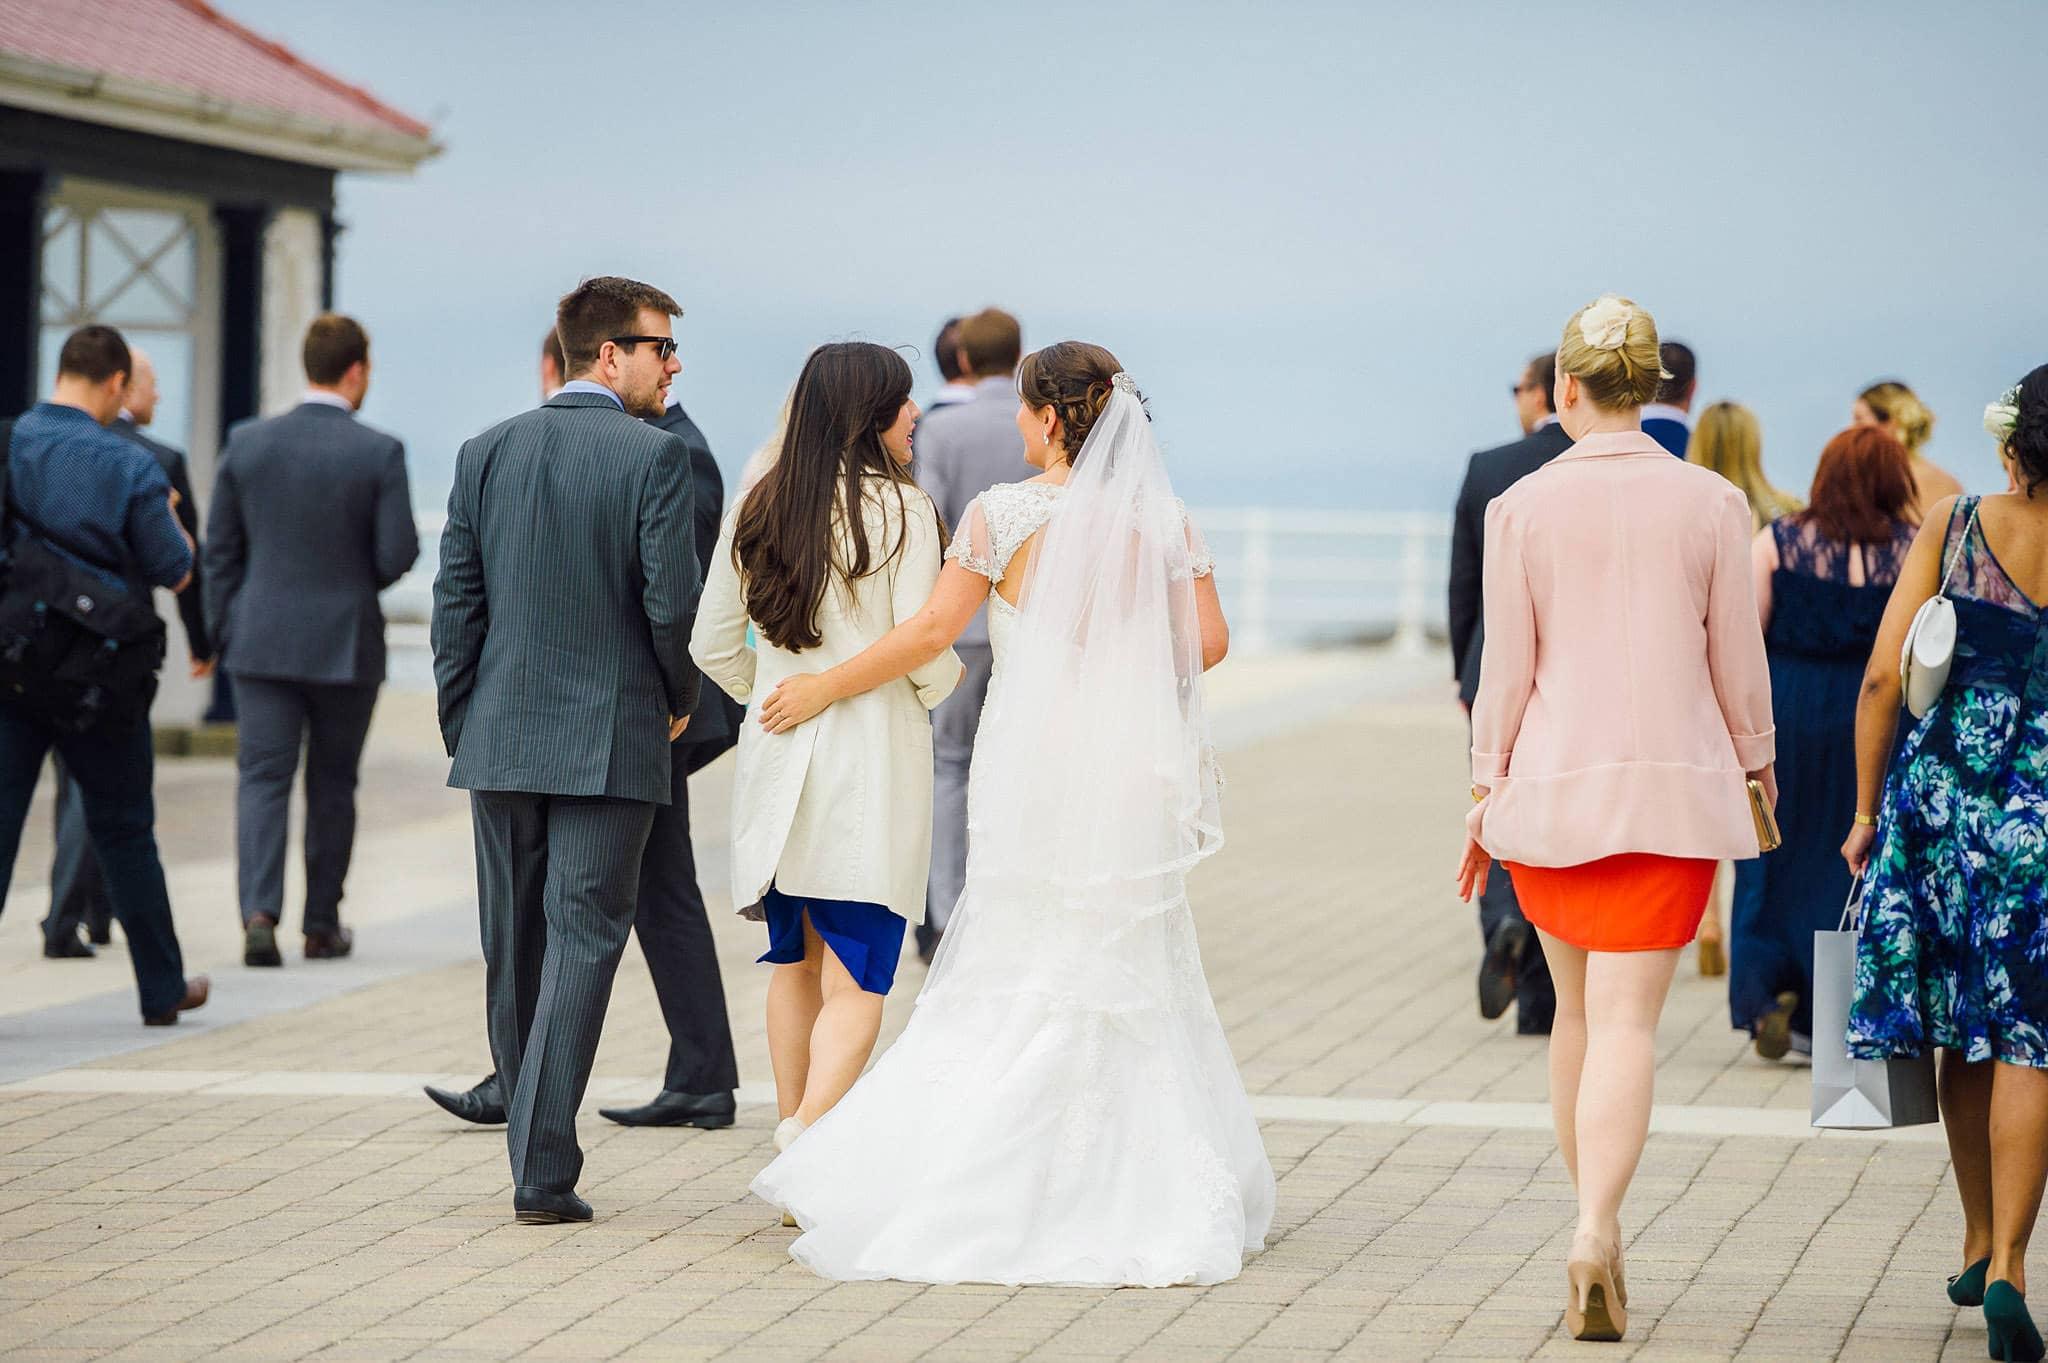 wedding-photographer-aberystwyth-wales (102)